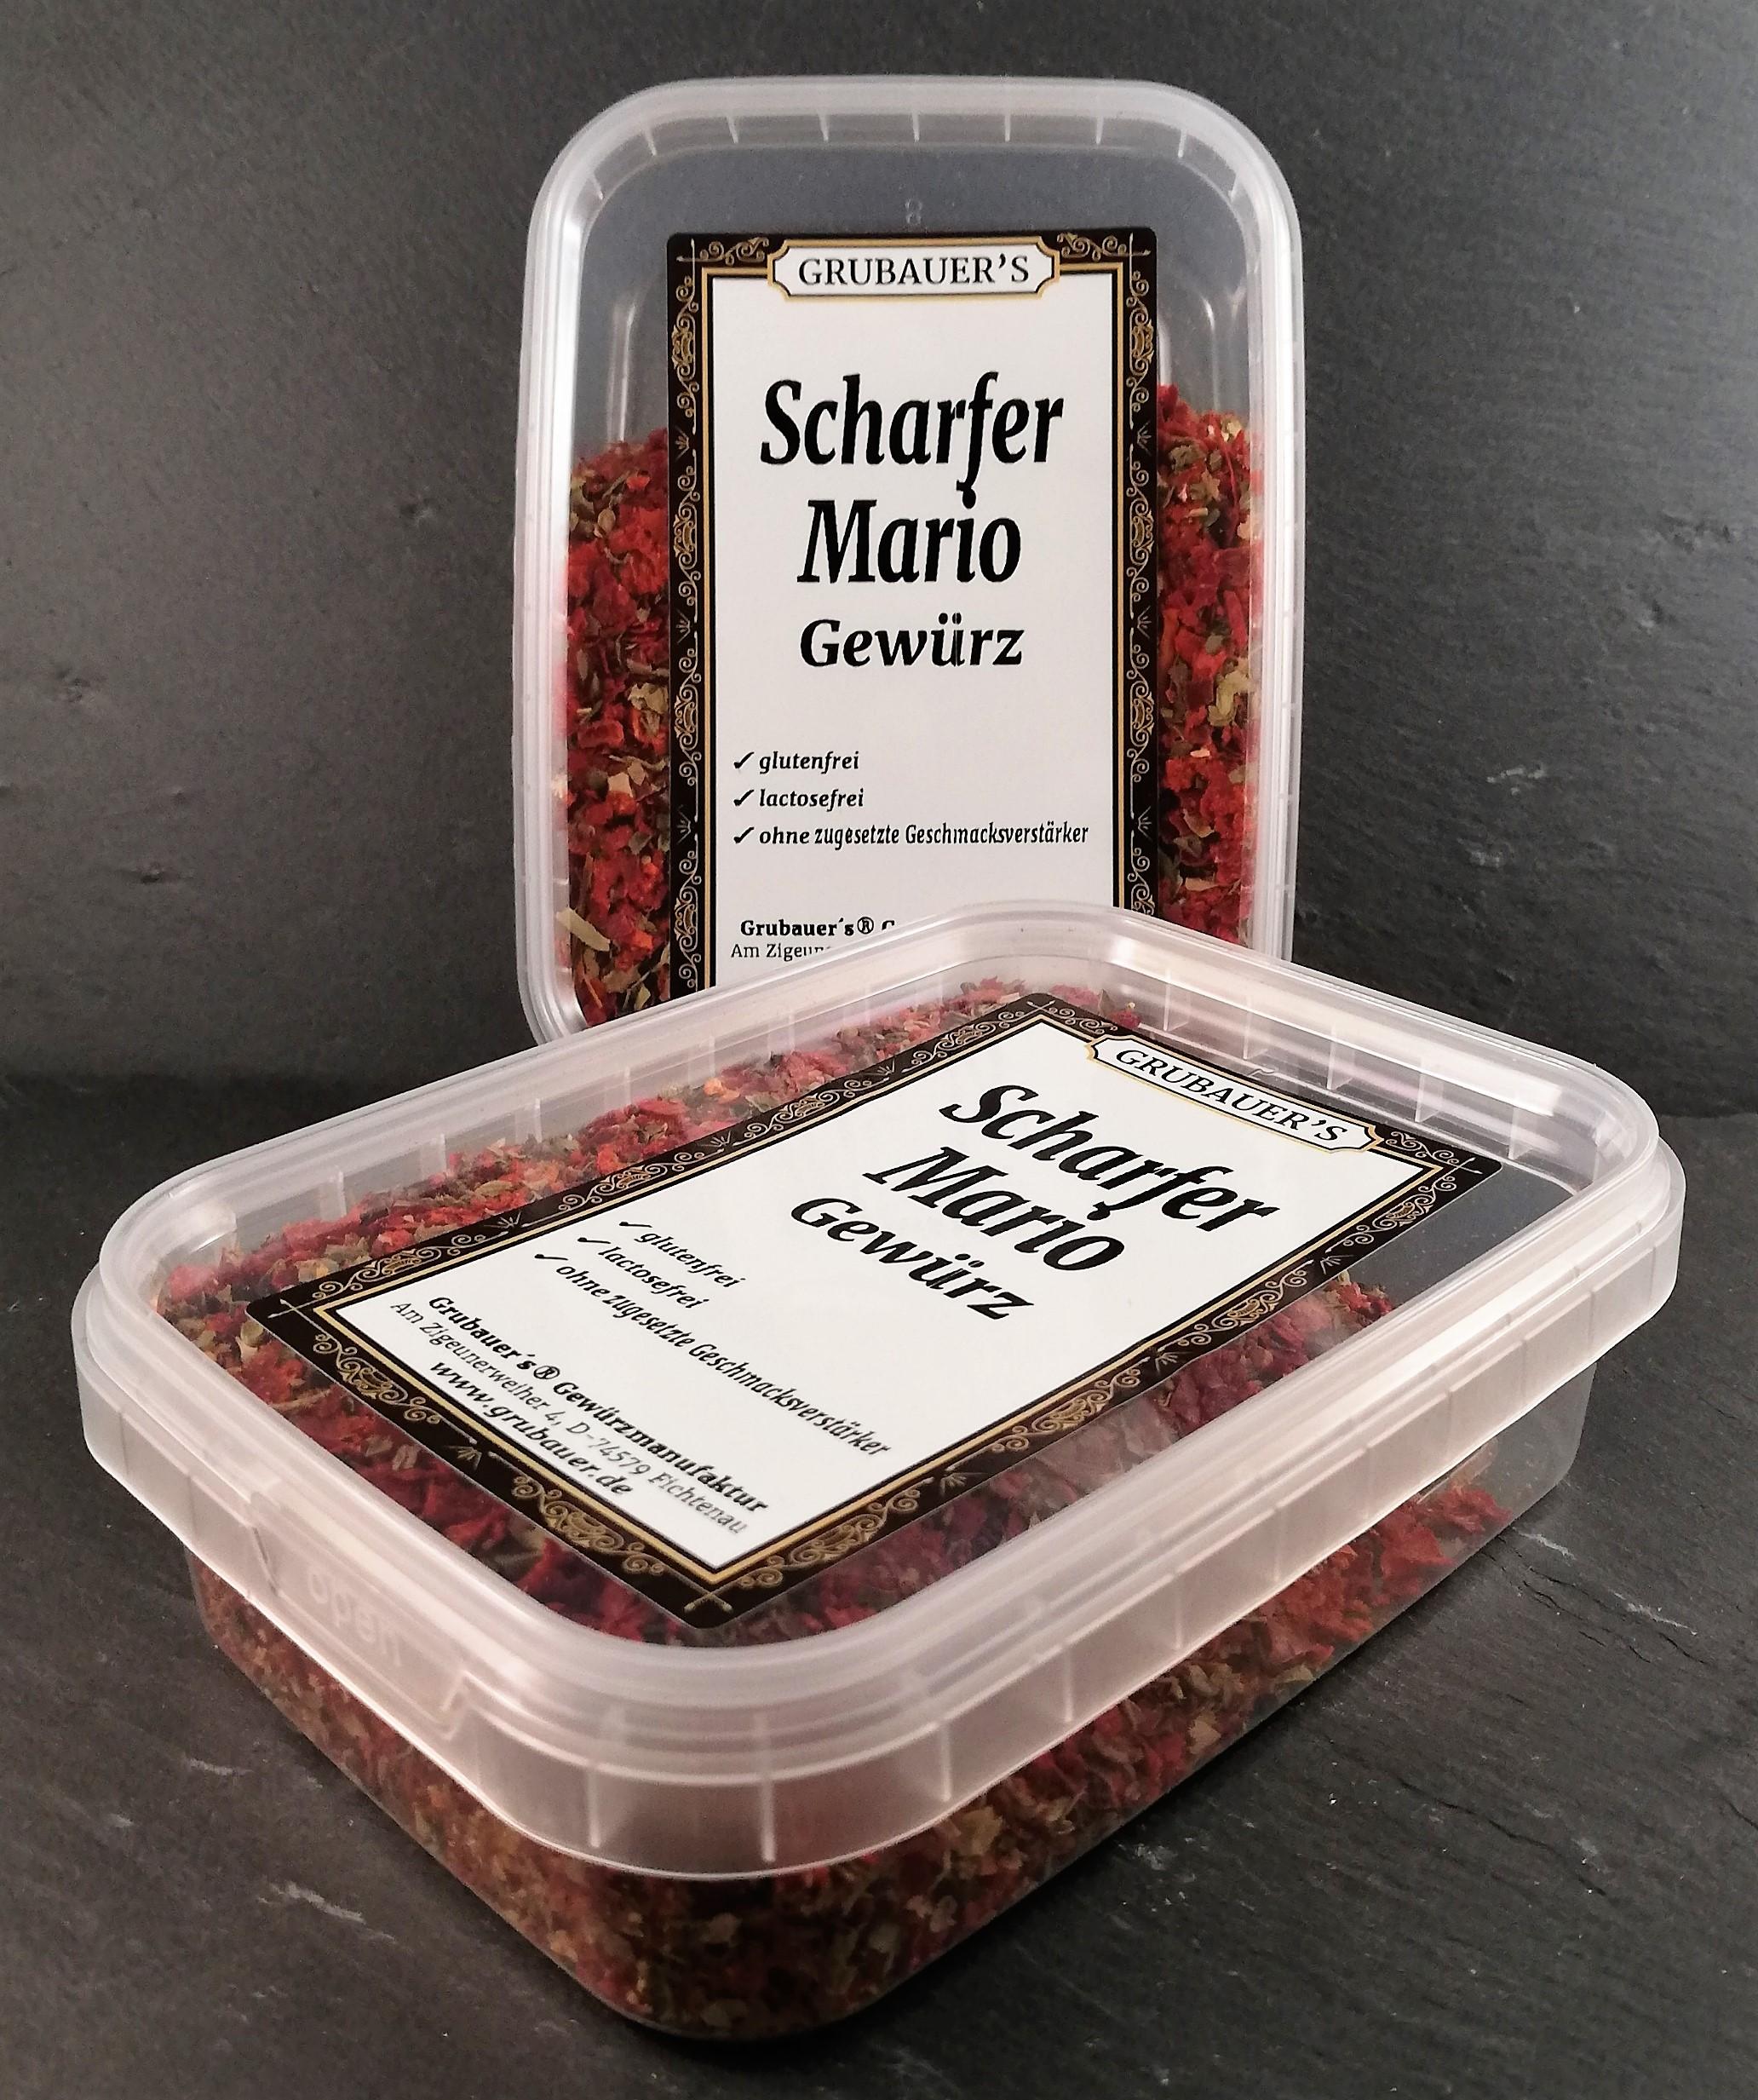 Scharfer Mario